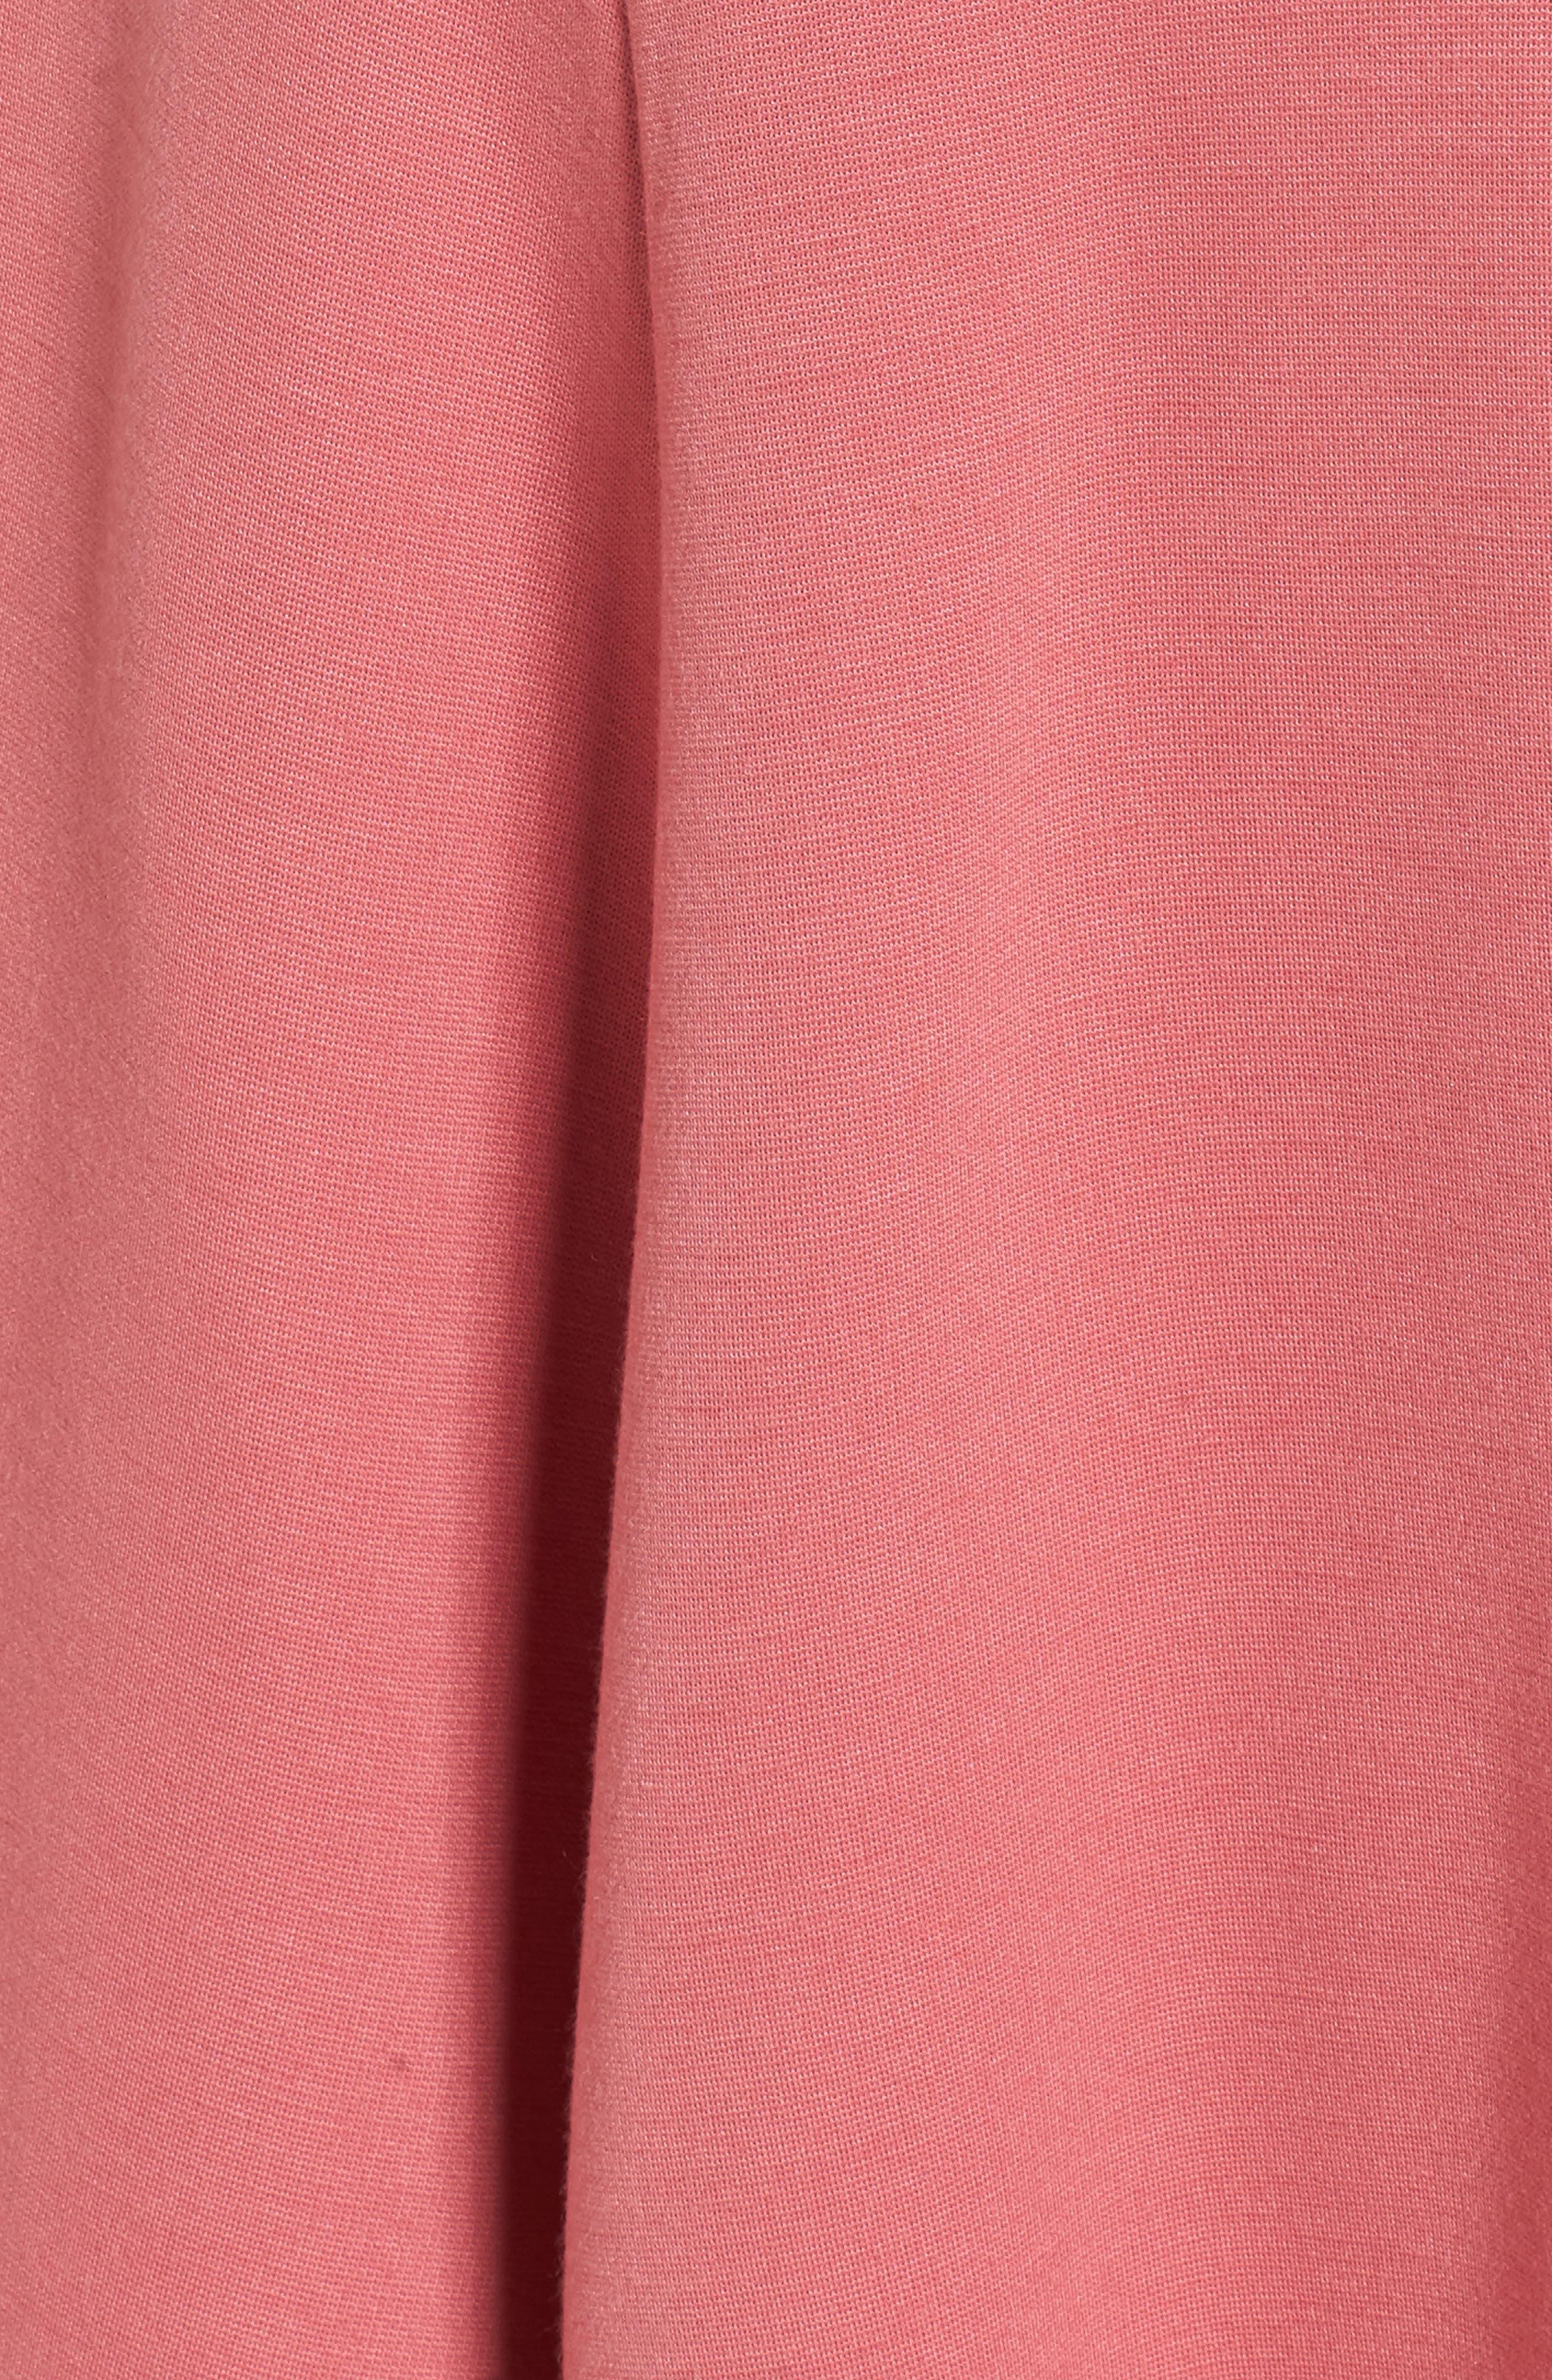 Stretch Knit Midi Dress,                             Alternate thumbnail 48, color,